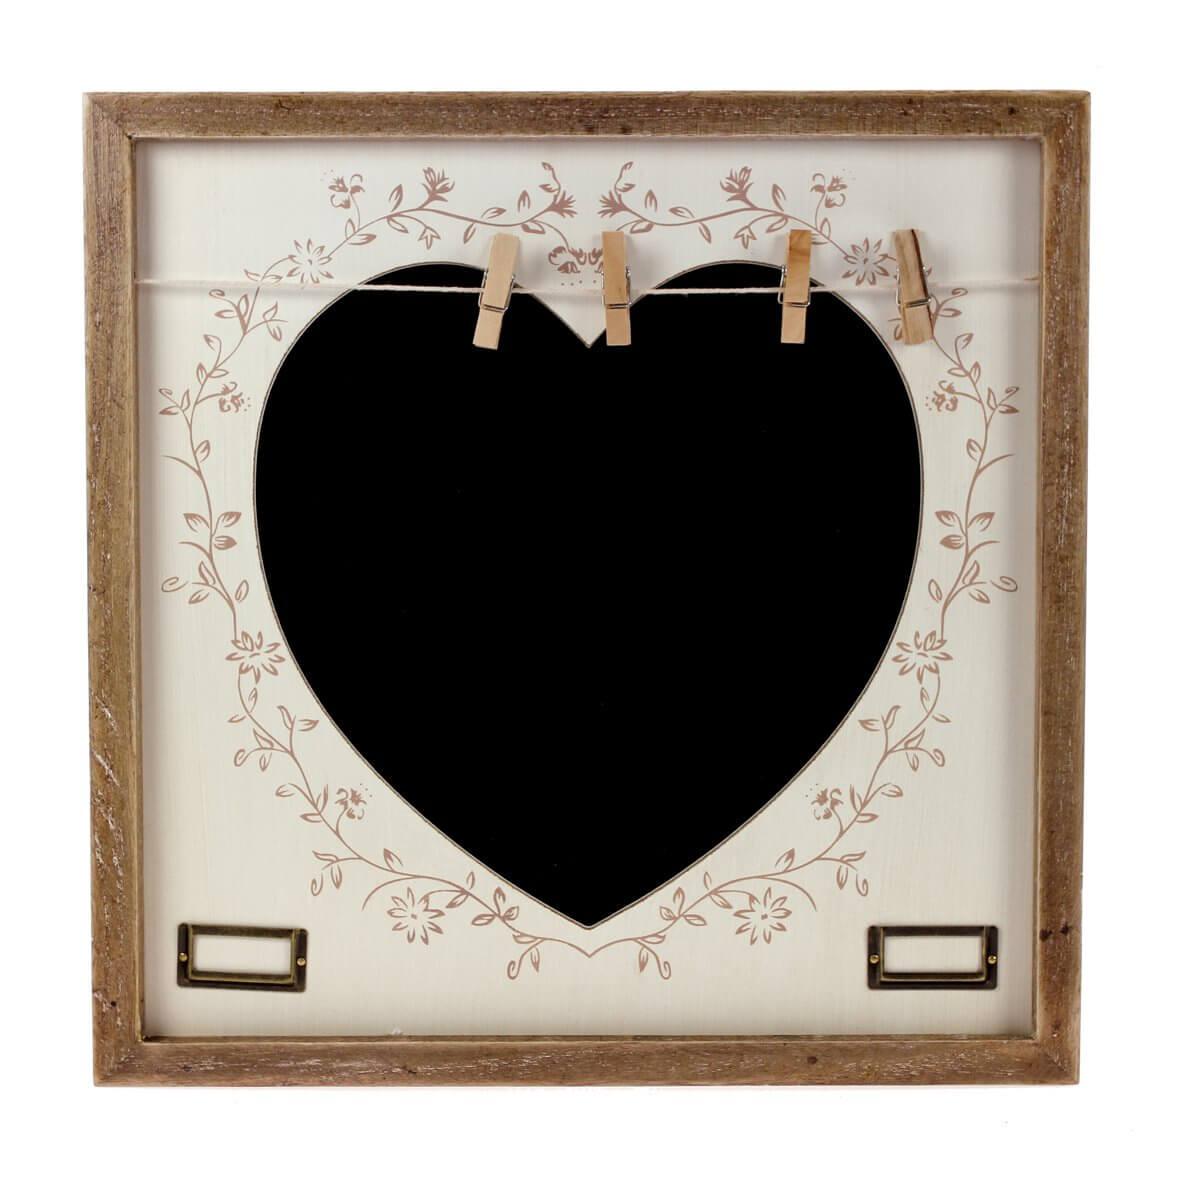 'Filigree Heart' Chalk Board with Pegs